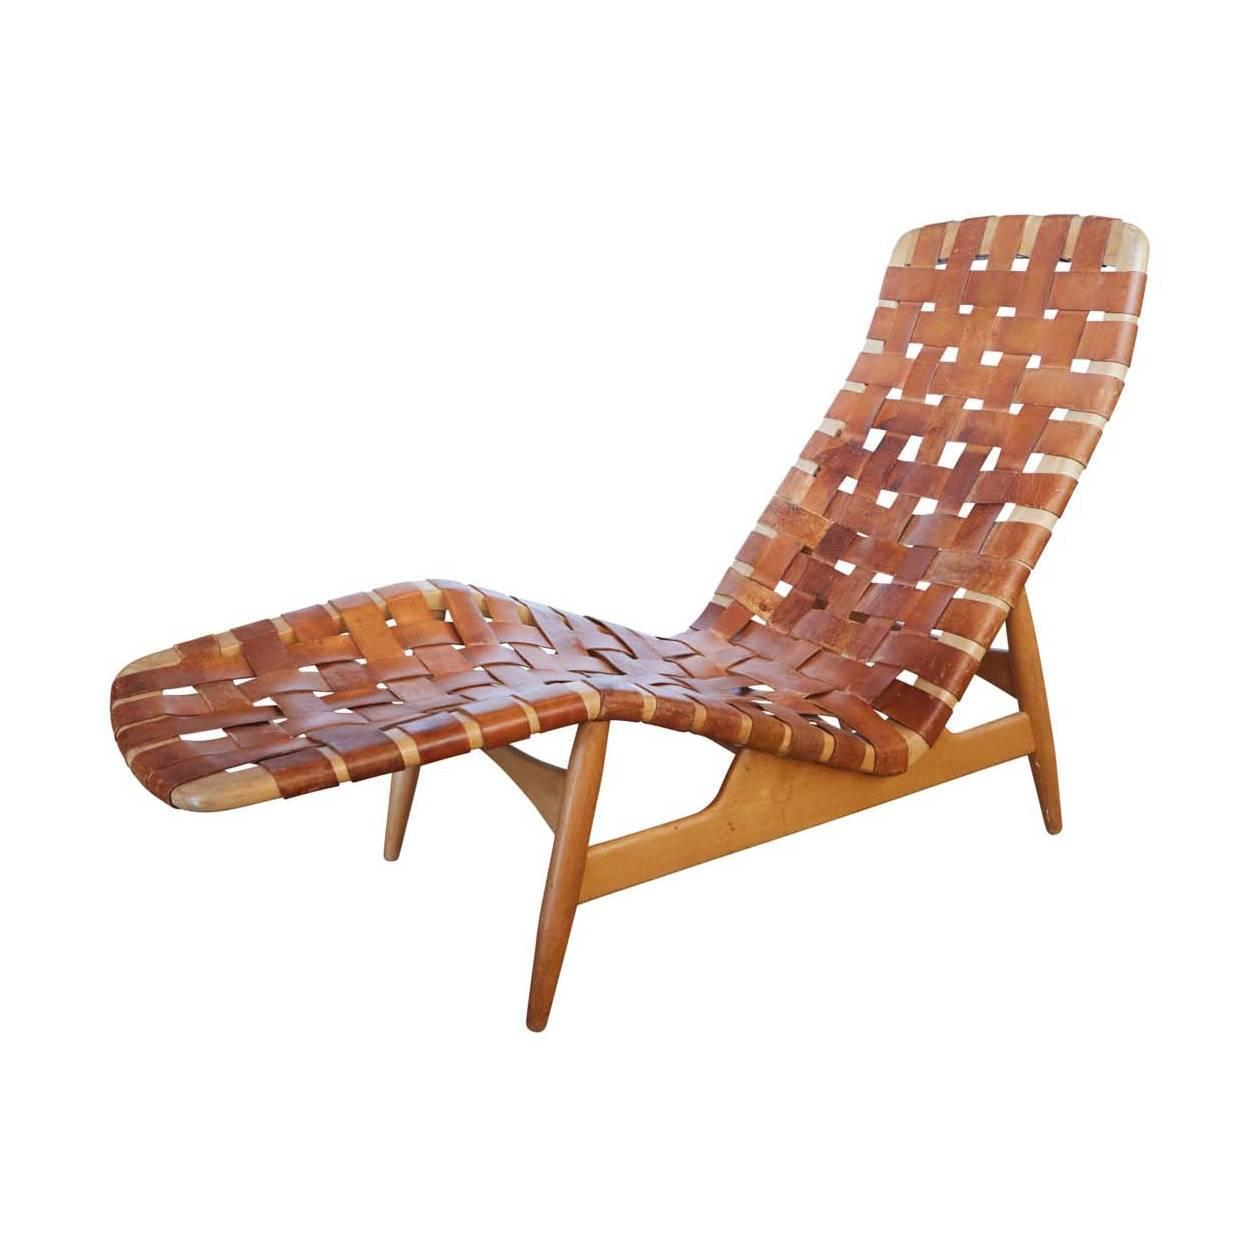 Arne Vodder chaise lounge, 1952